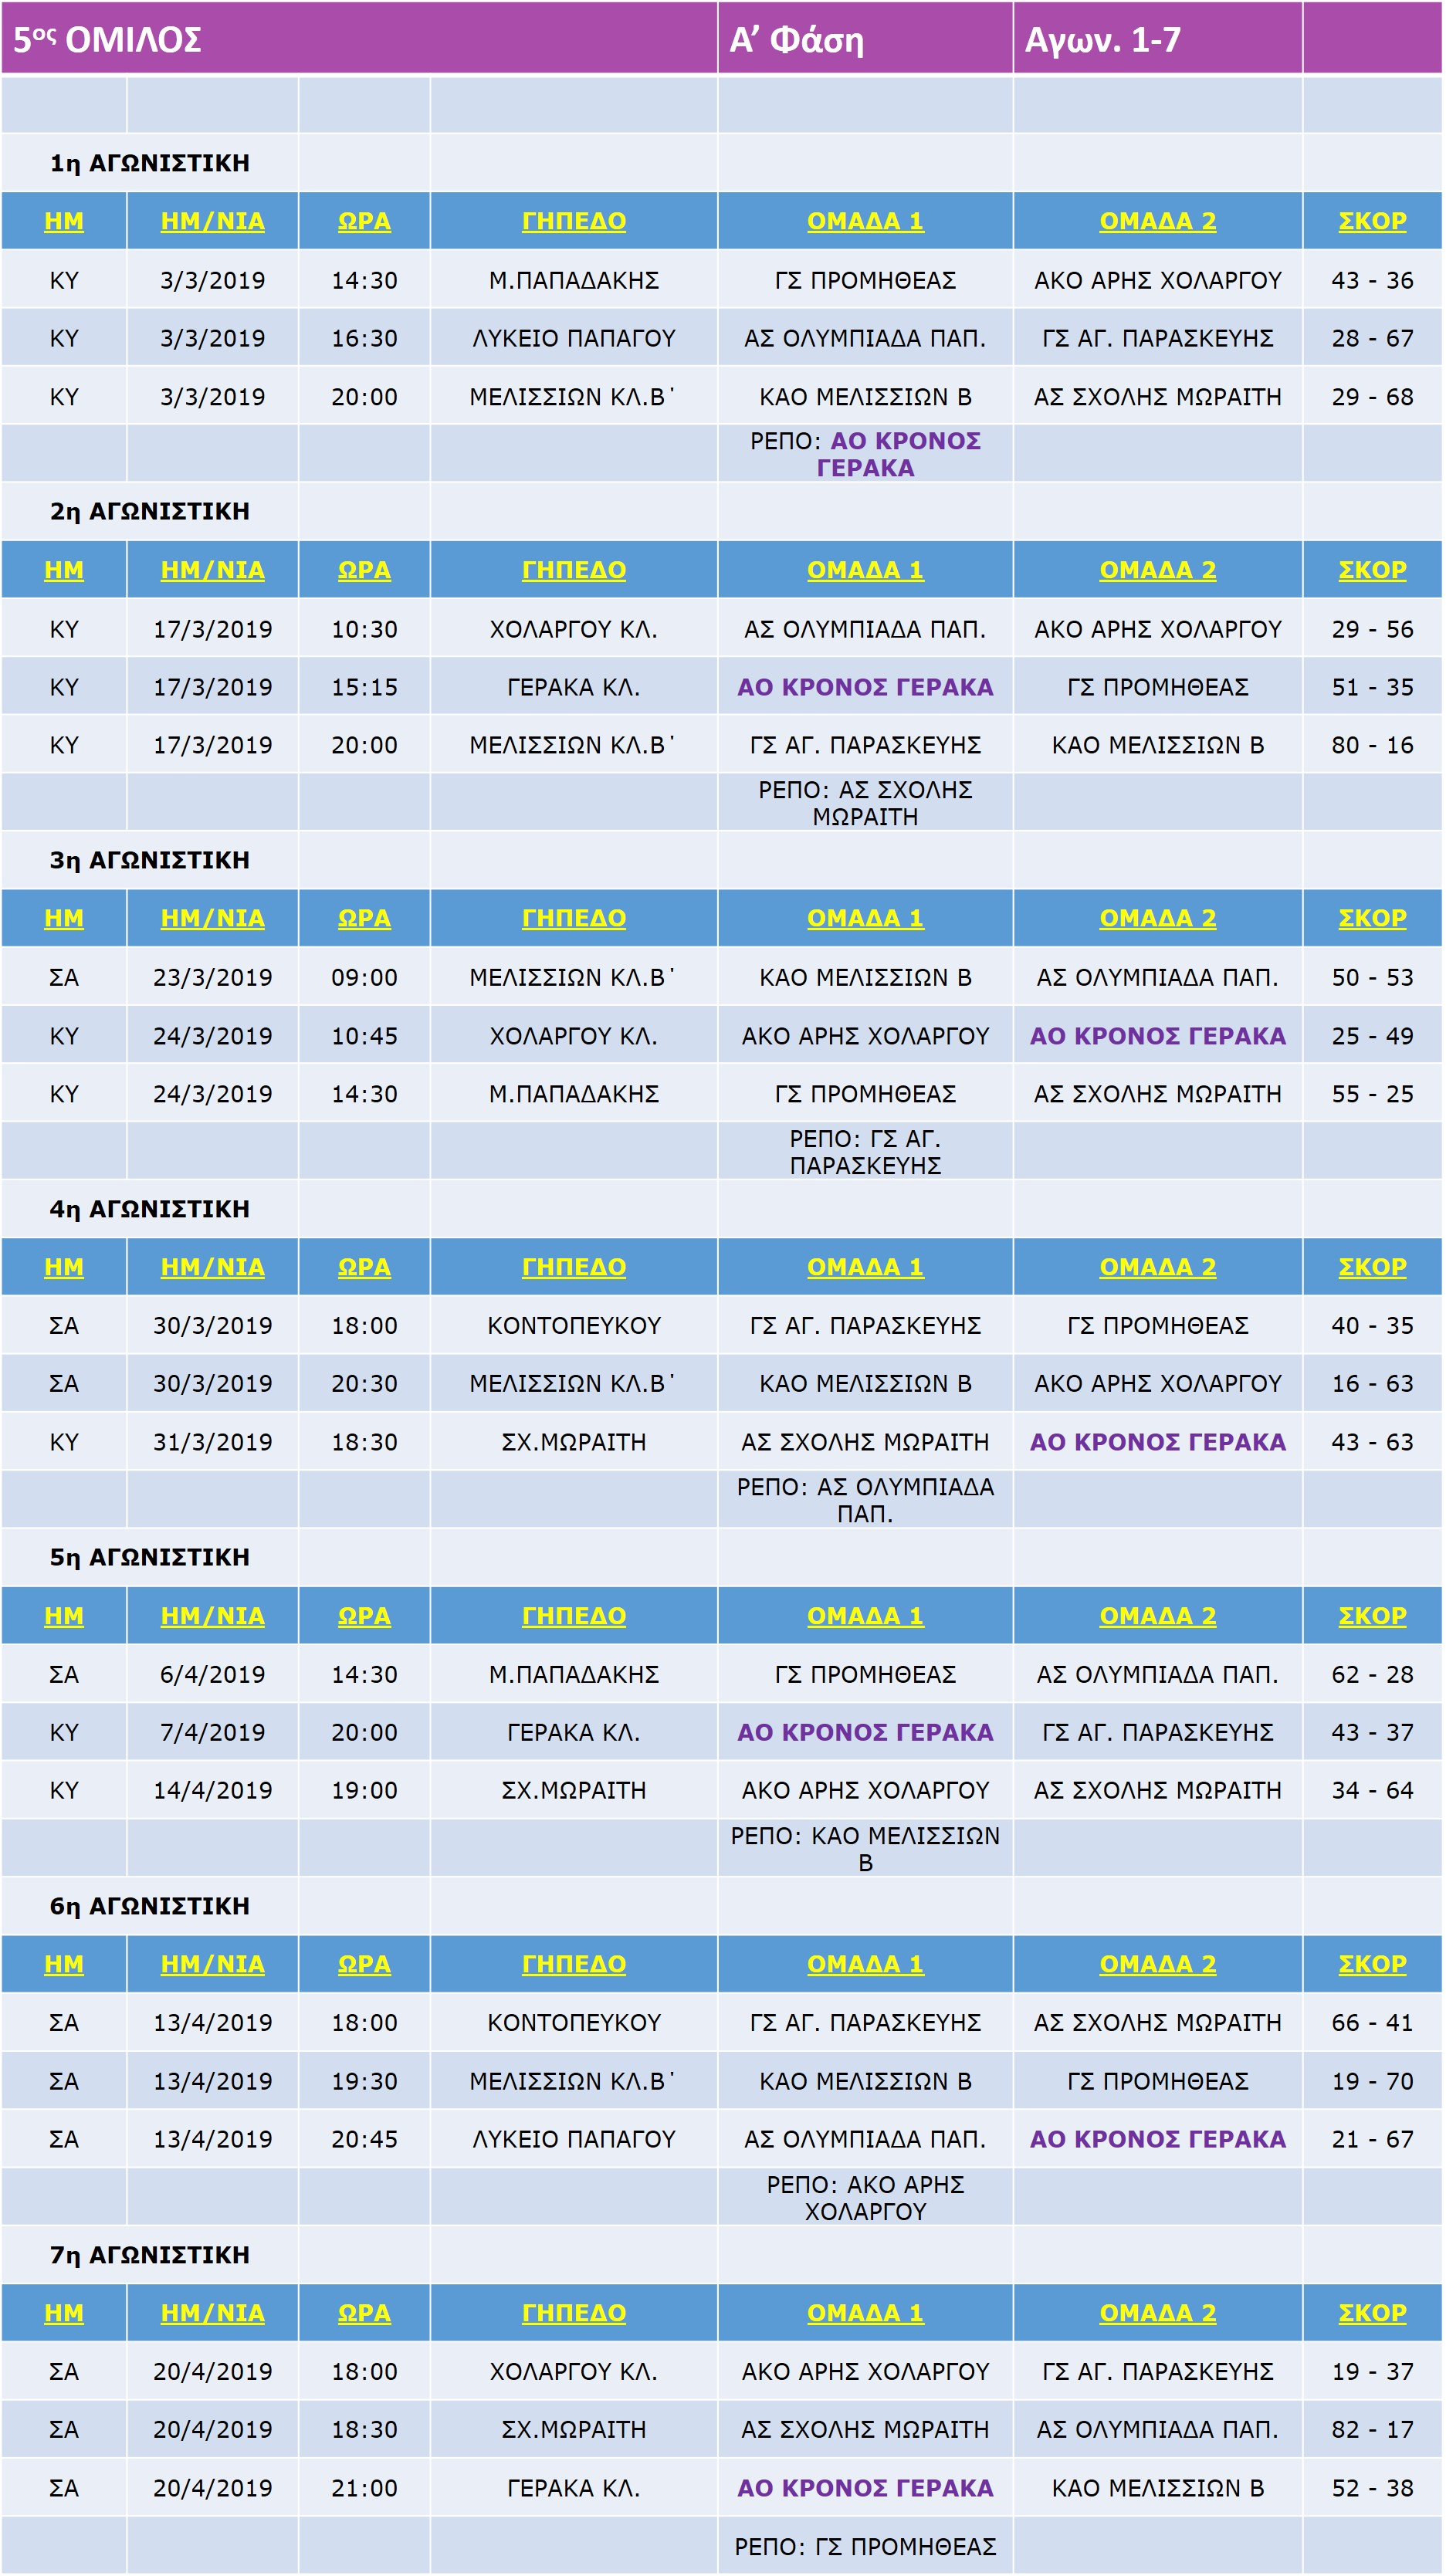 Pagkorasides_Match_A_1-7-7